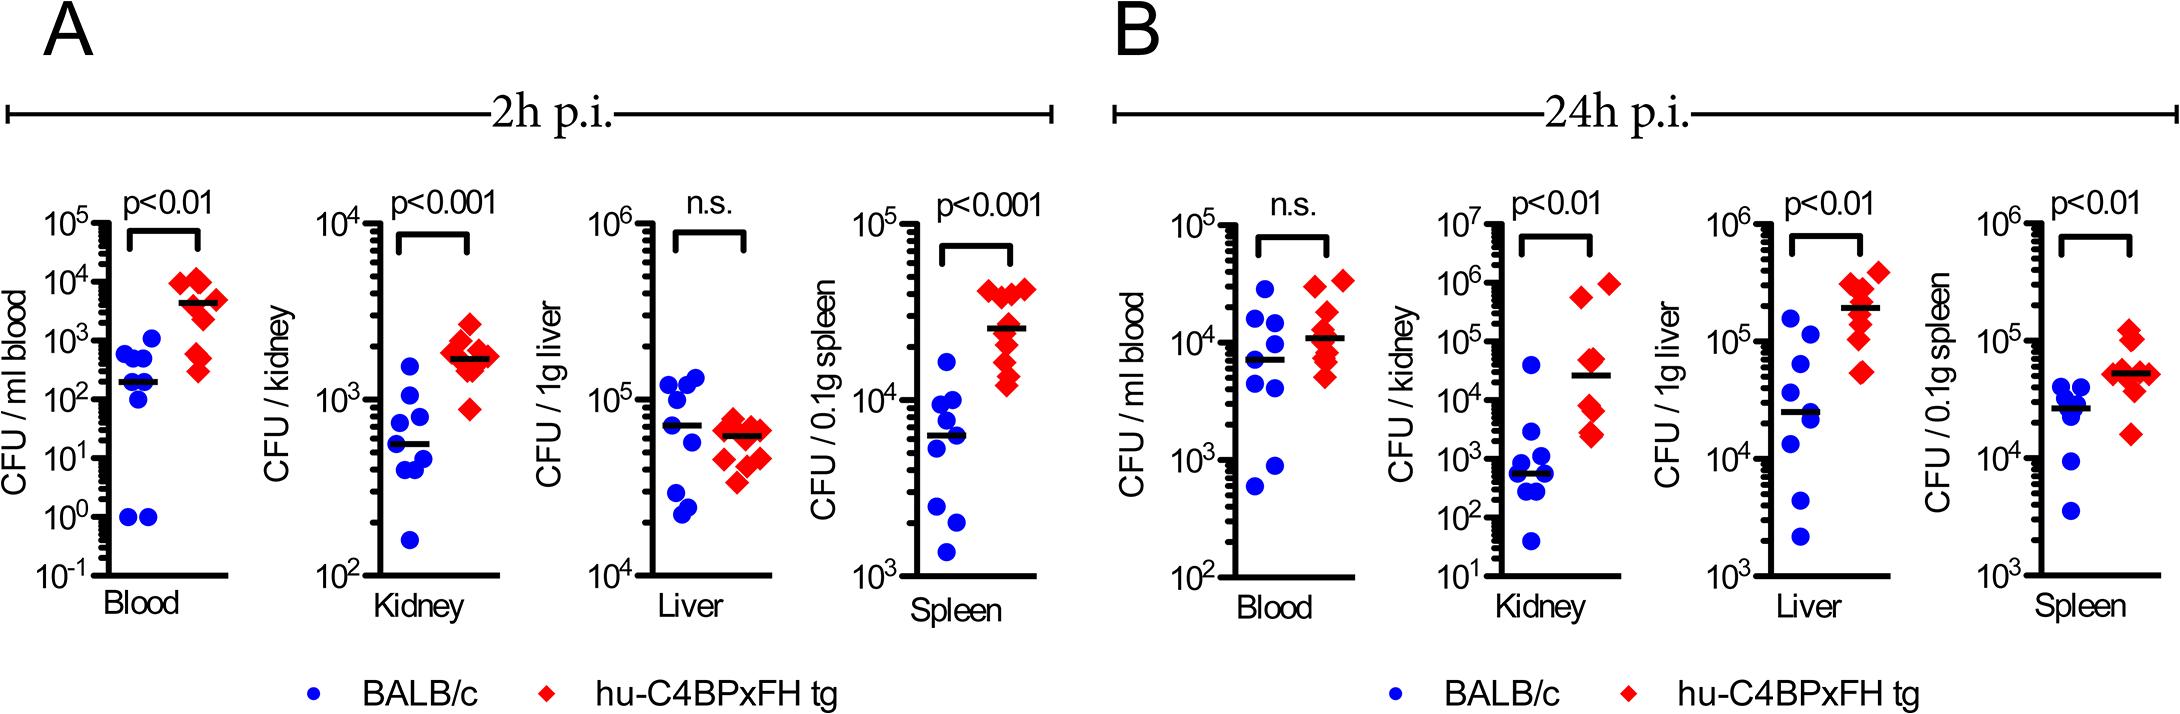 Hu-C4BPxFH tg mice show increased bacterial dissemination in organs.